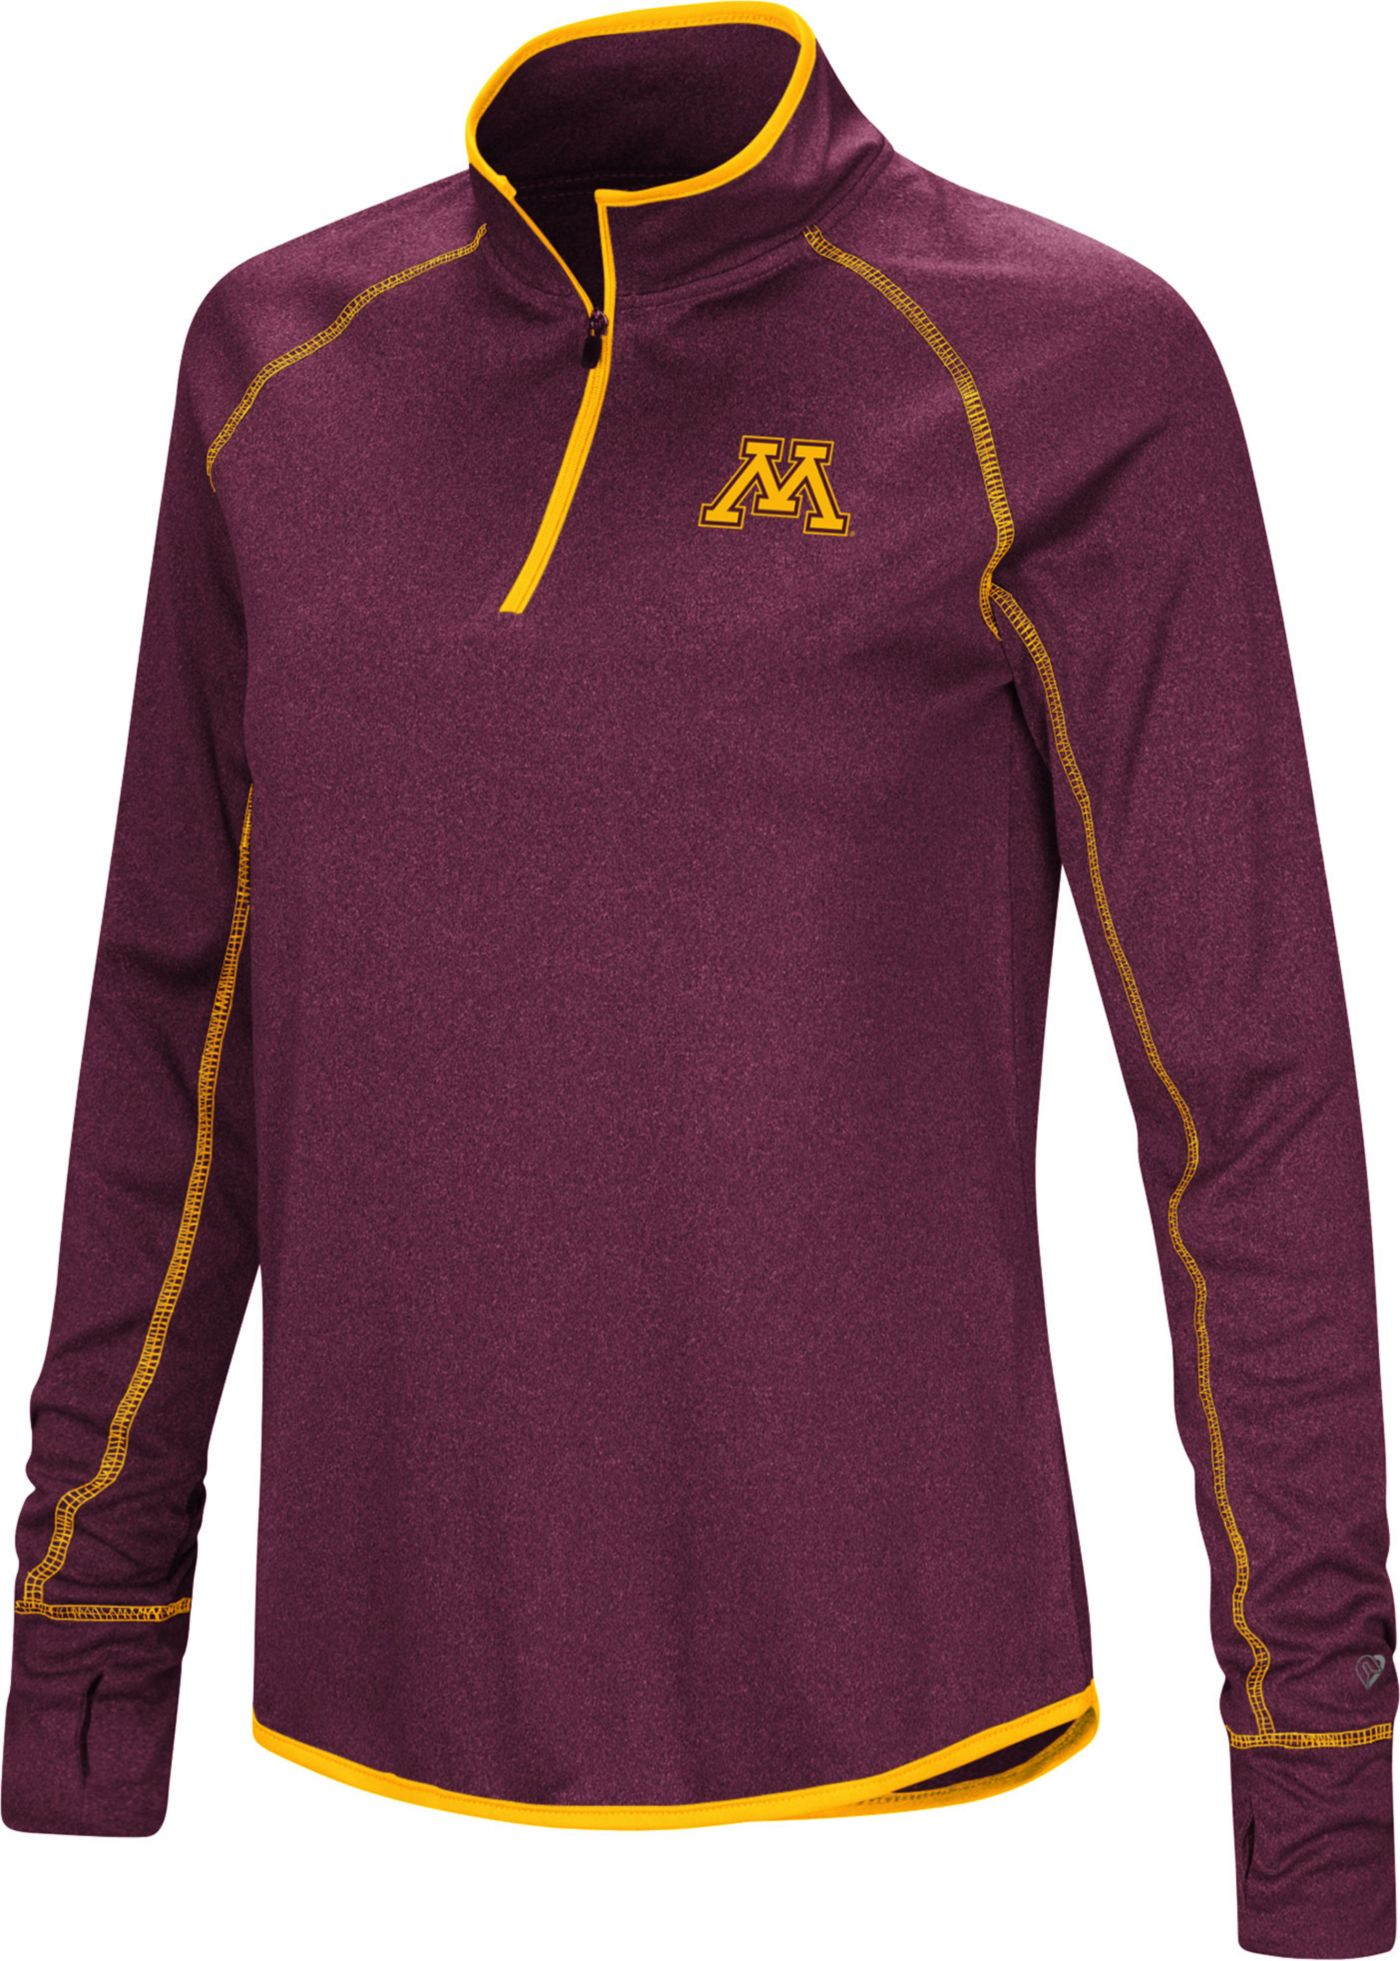 Colosseum Women's Minnesota Golden Gophers Maroon Stingray Quarter-Zip Shirt